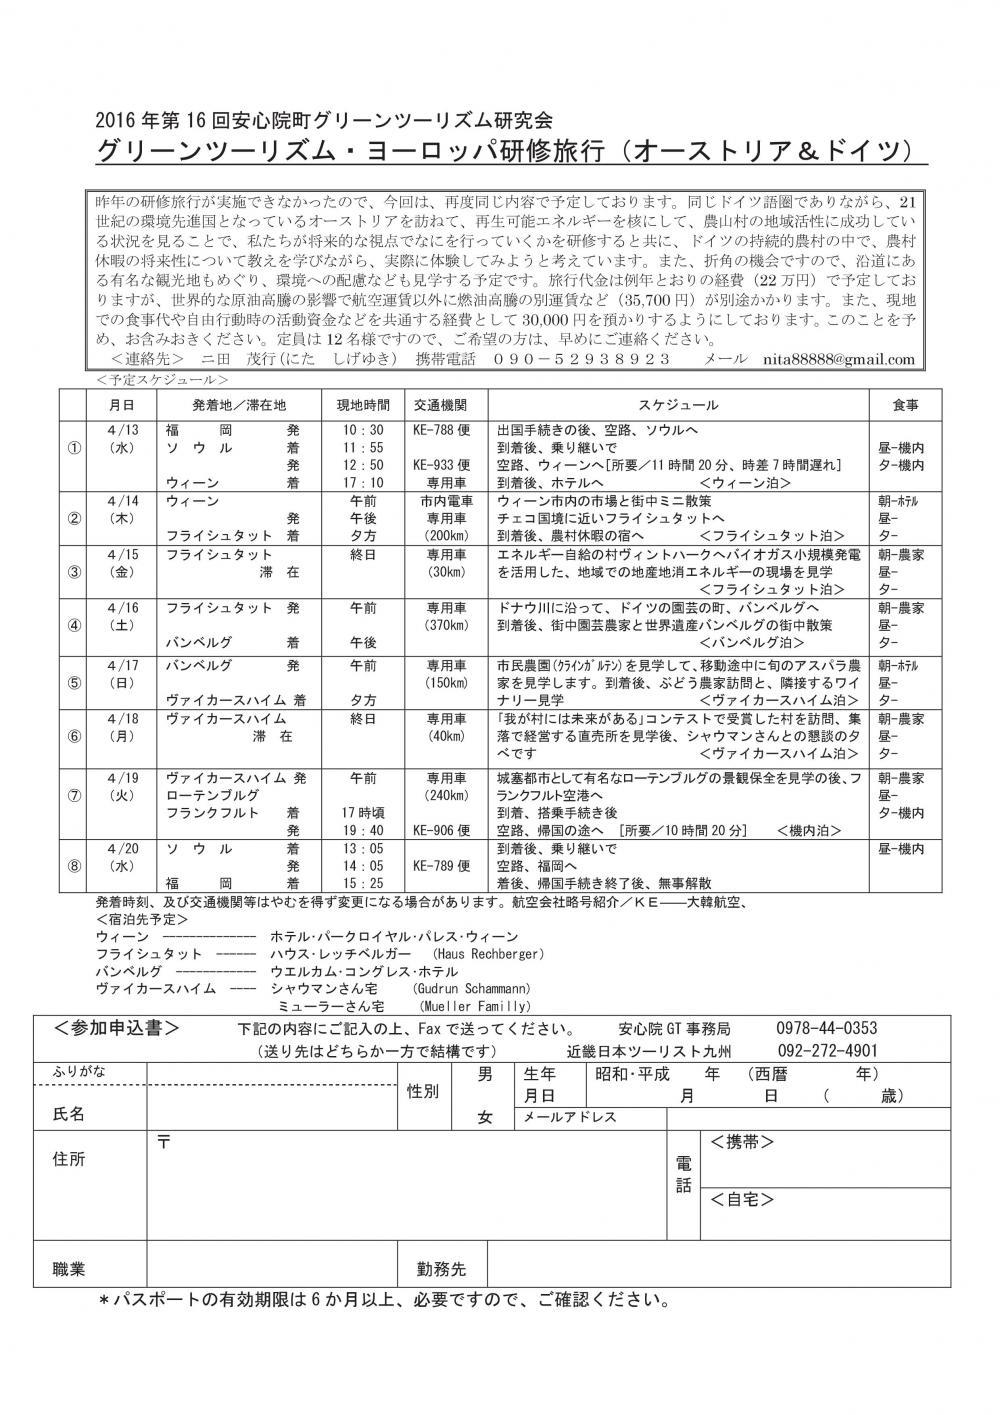 https://img01.ecgo.jp/usr/ajimu/img/151208144758.jpg